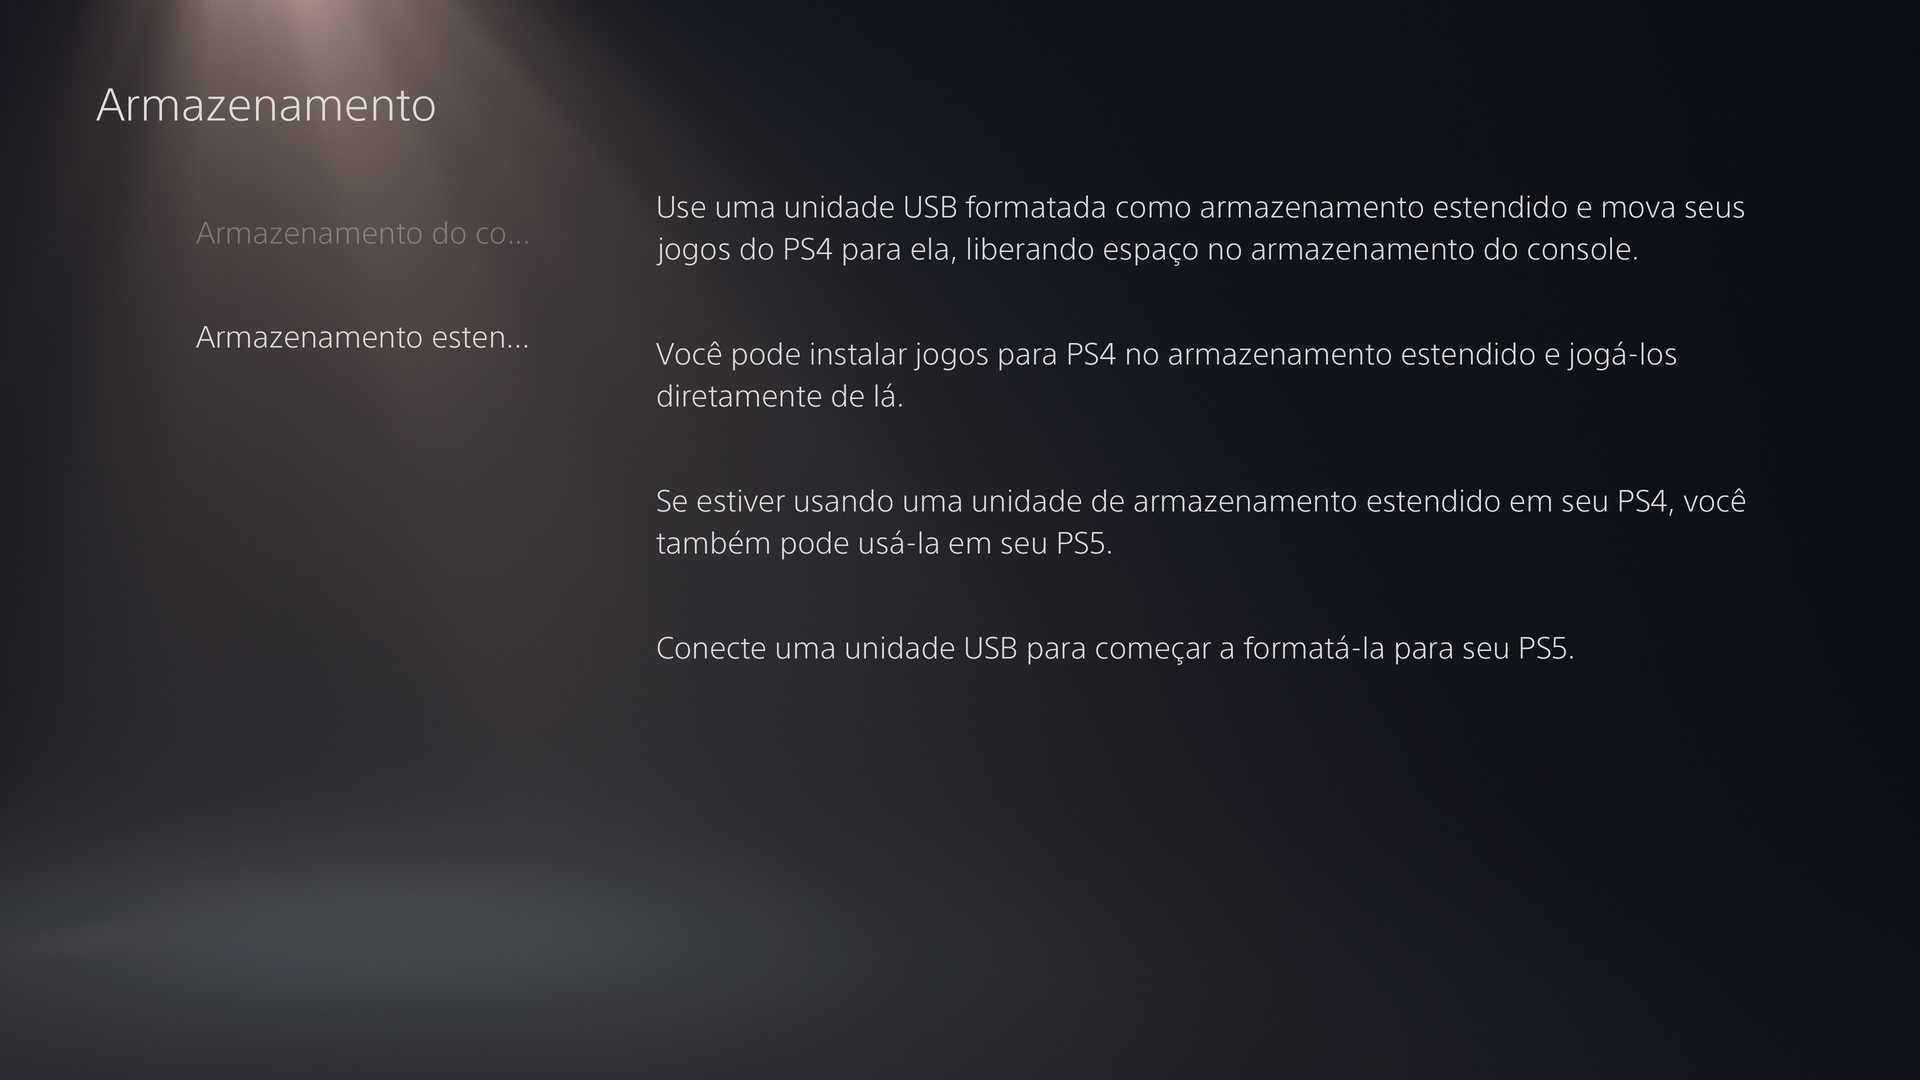 HD externo do PS4 no PS5 - dúvidas sobre o PS5